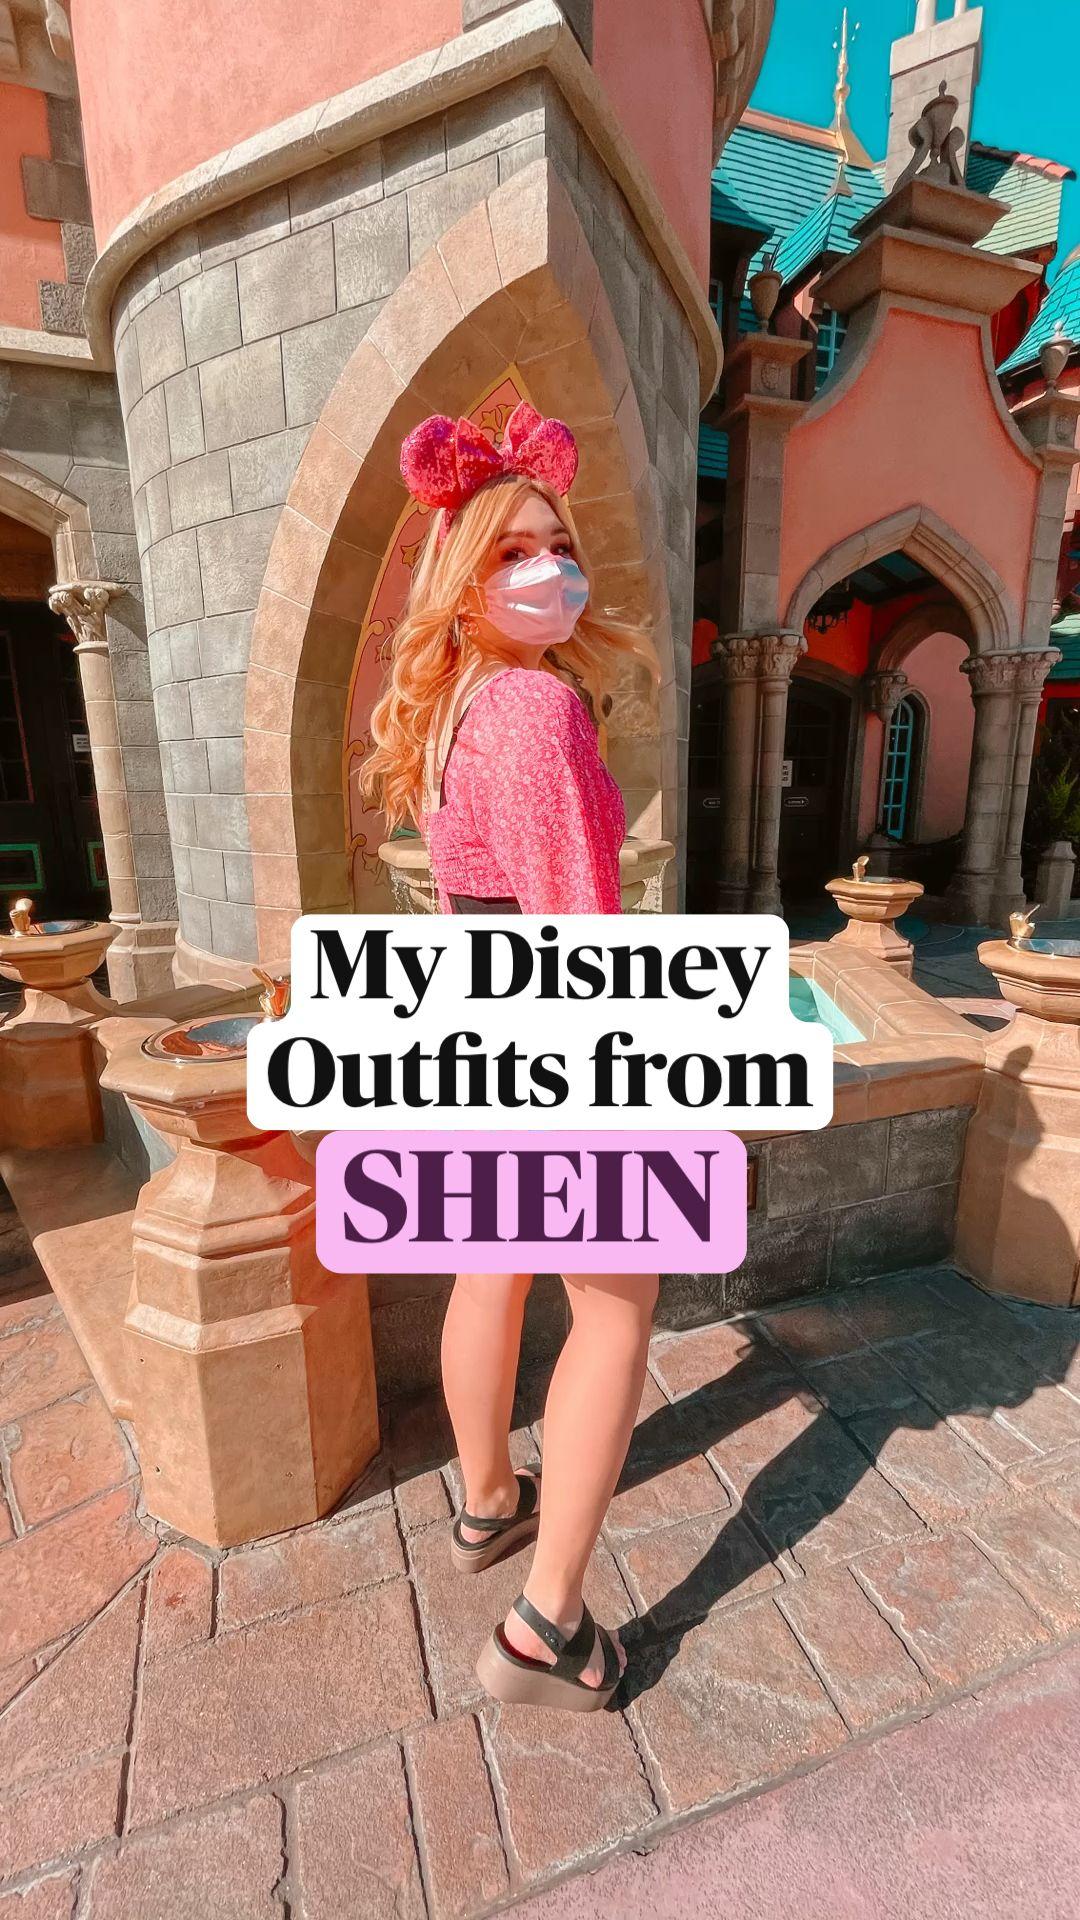 My Disney Outfits from SHEIN! - Disney style wdw fashion